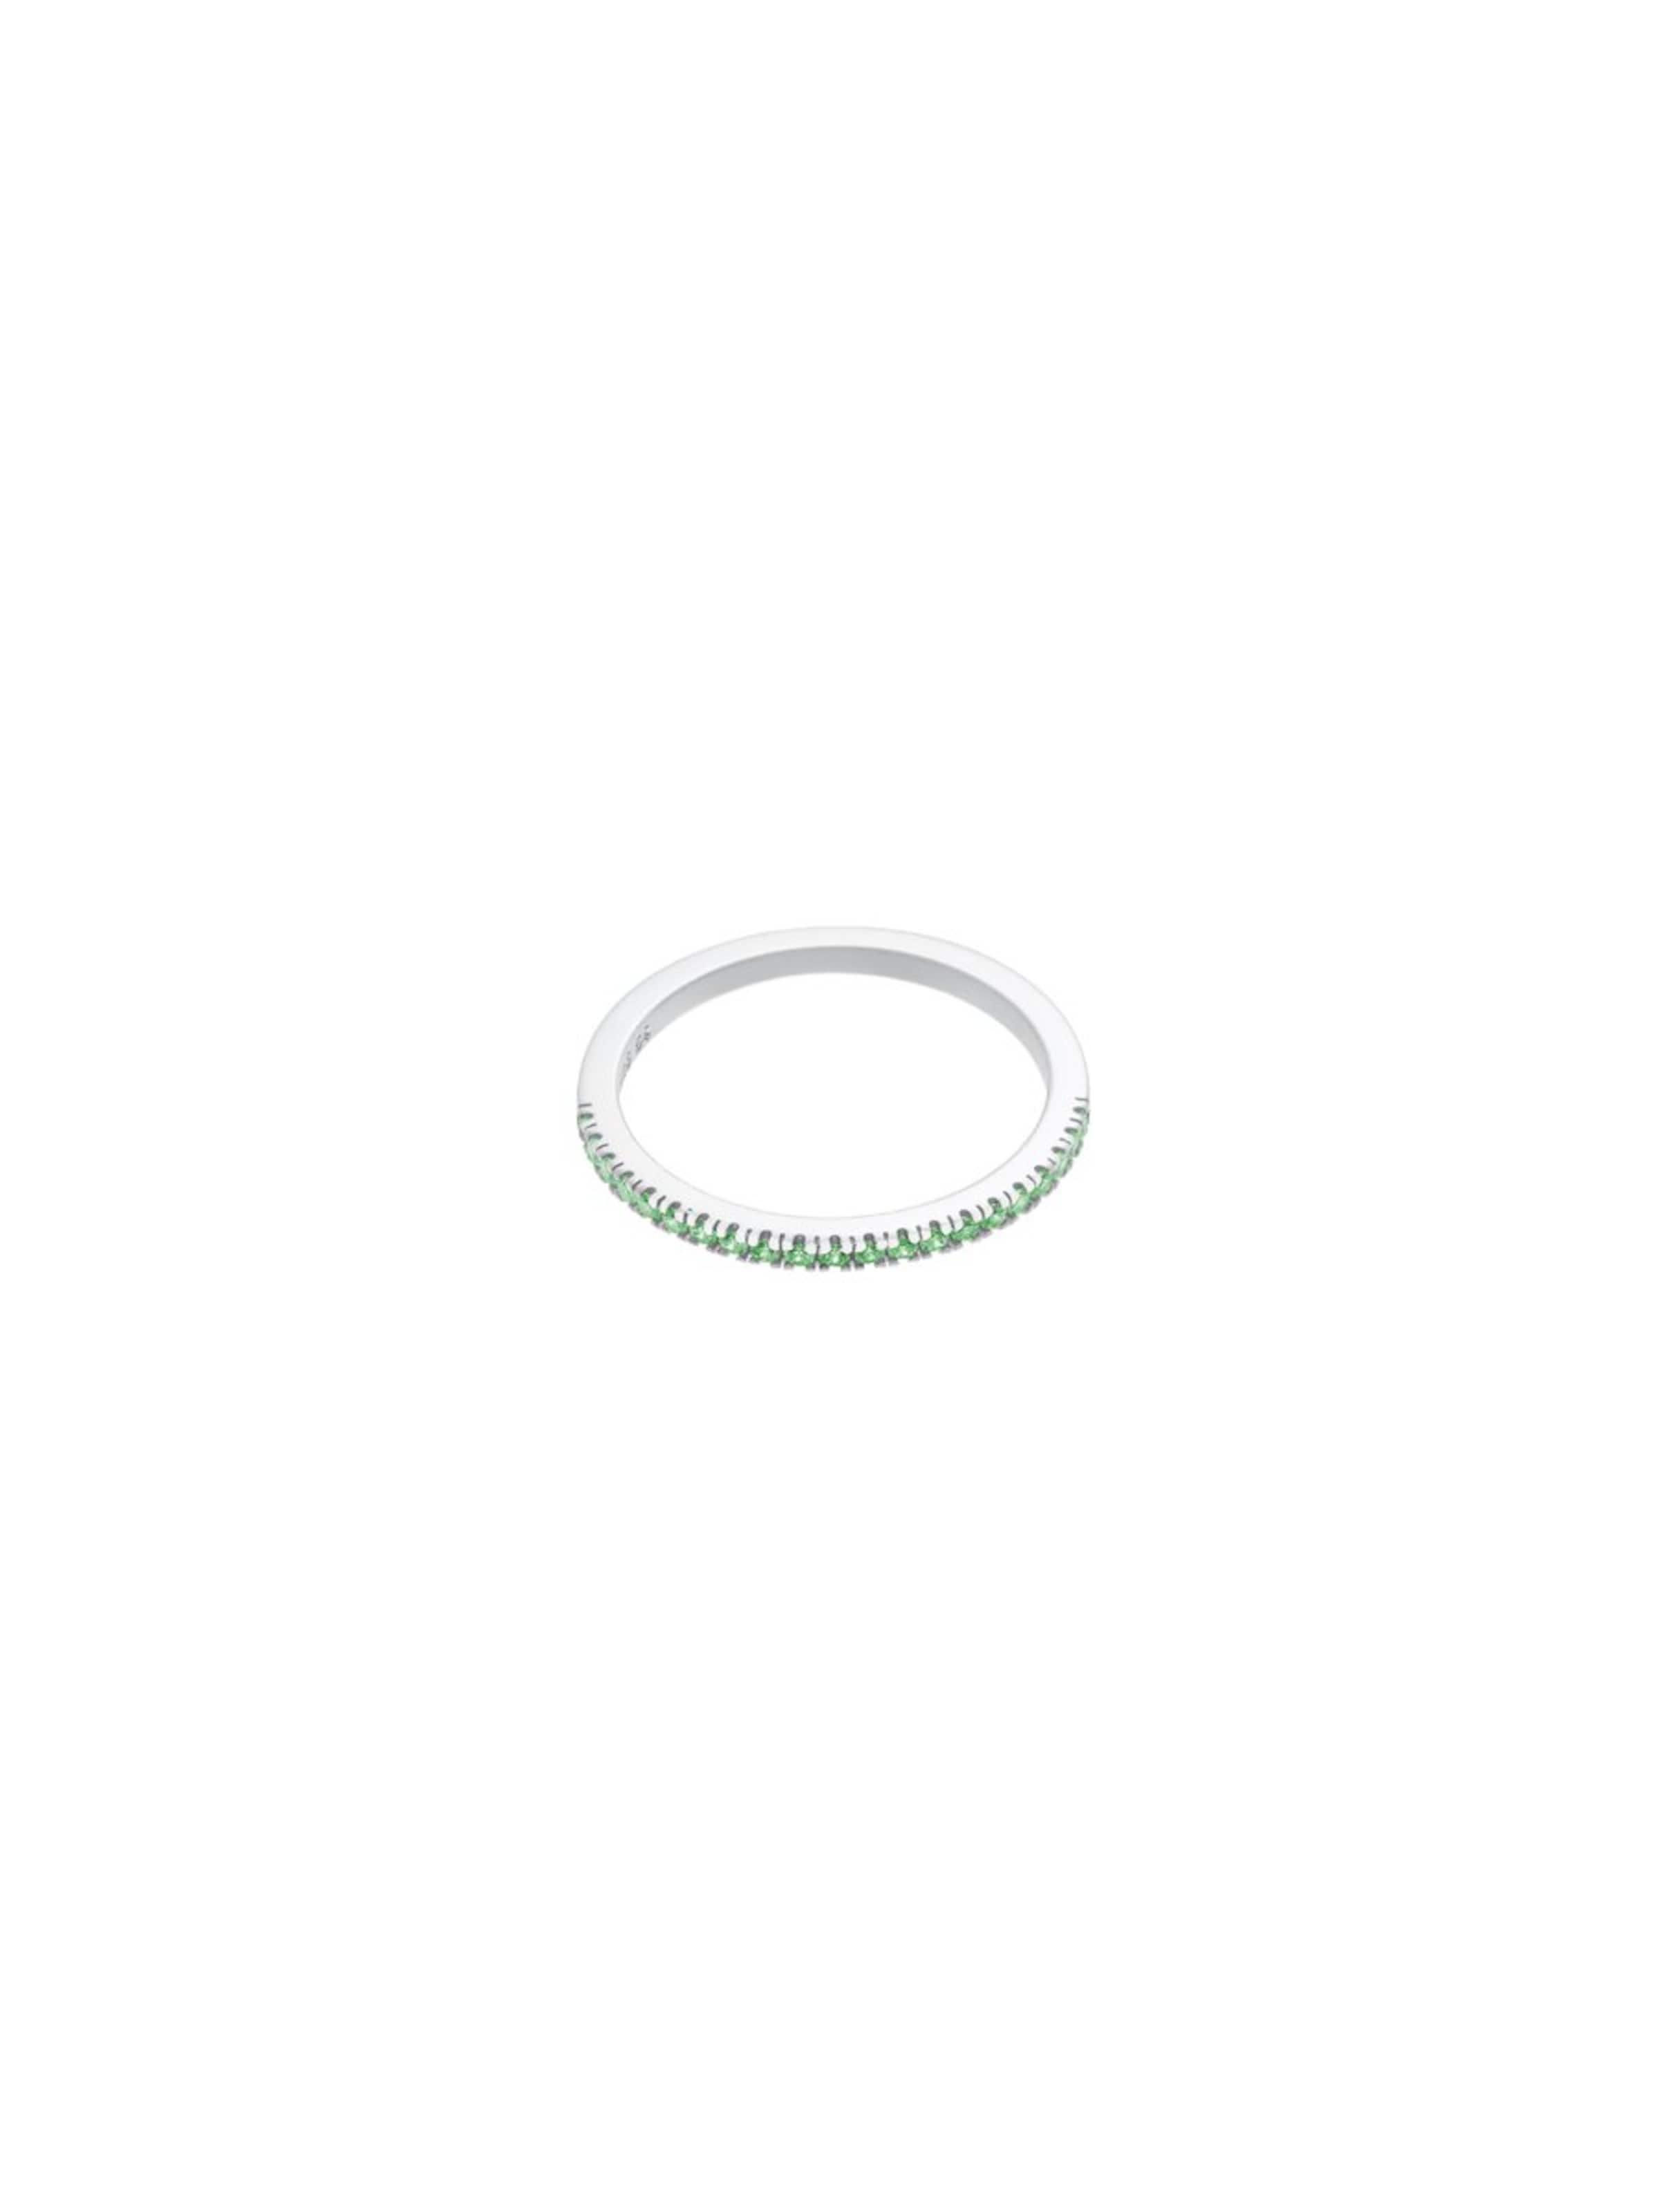 Vert Bague 'green Id Simplicity' En Fine ClairArgent A53Rj4L